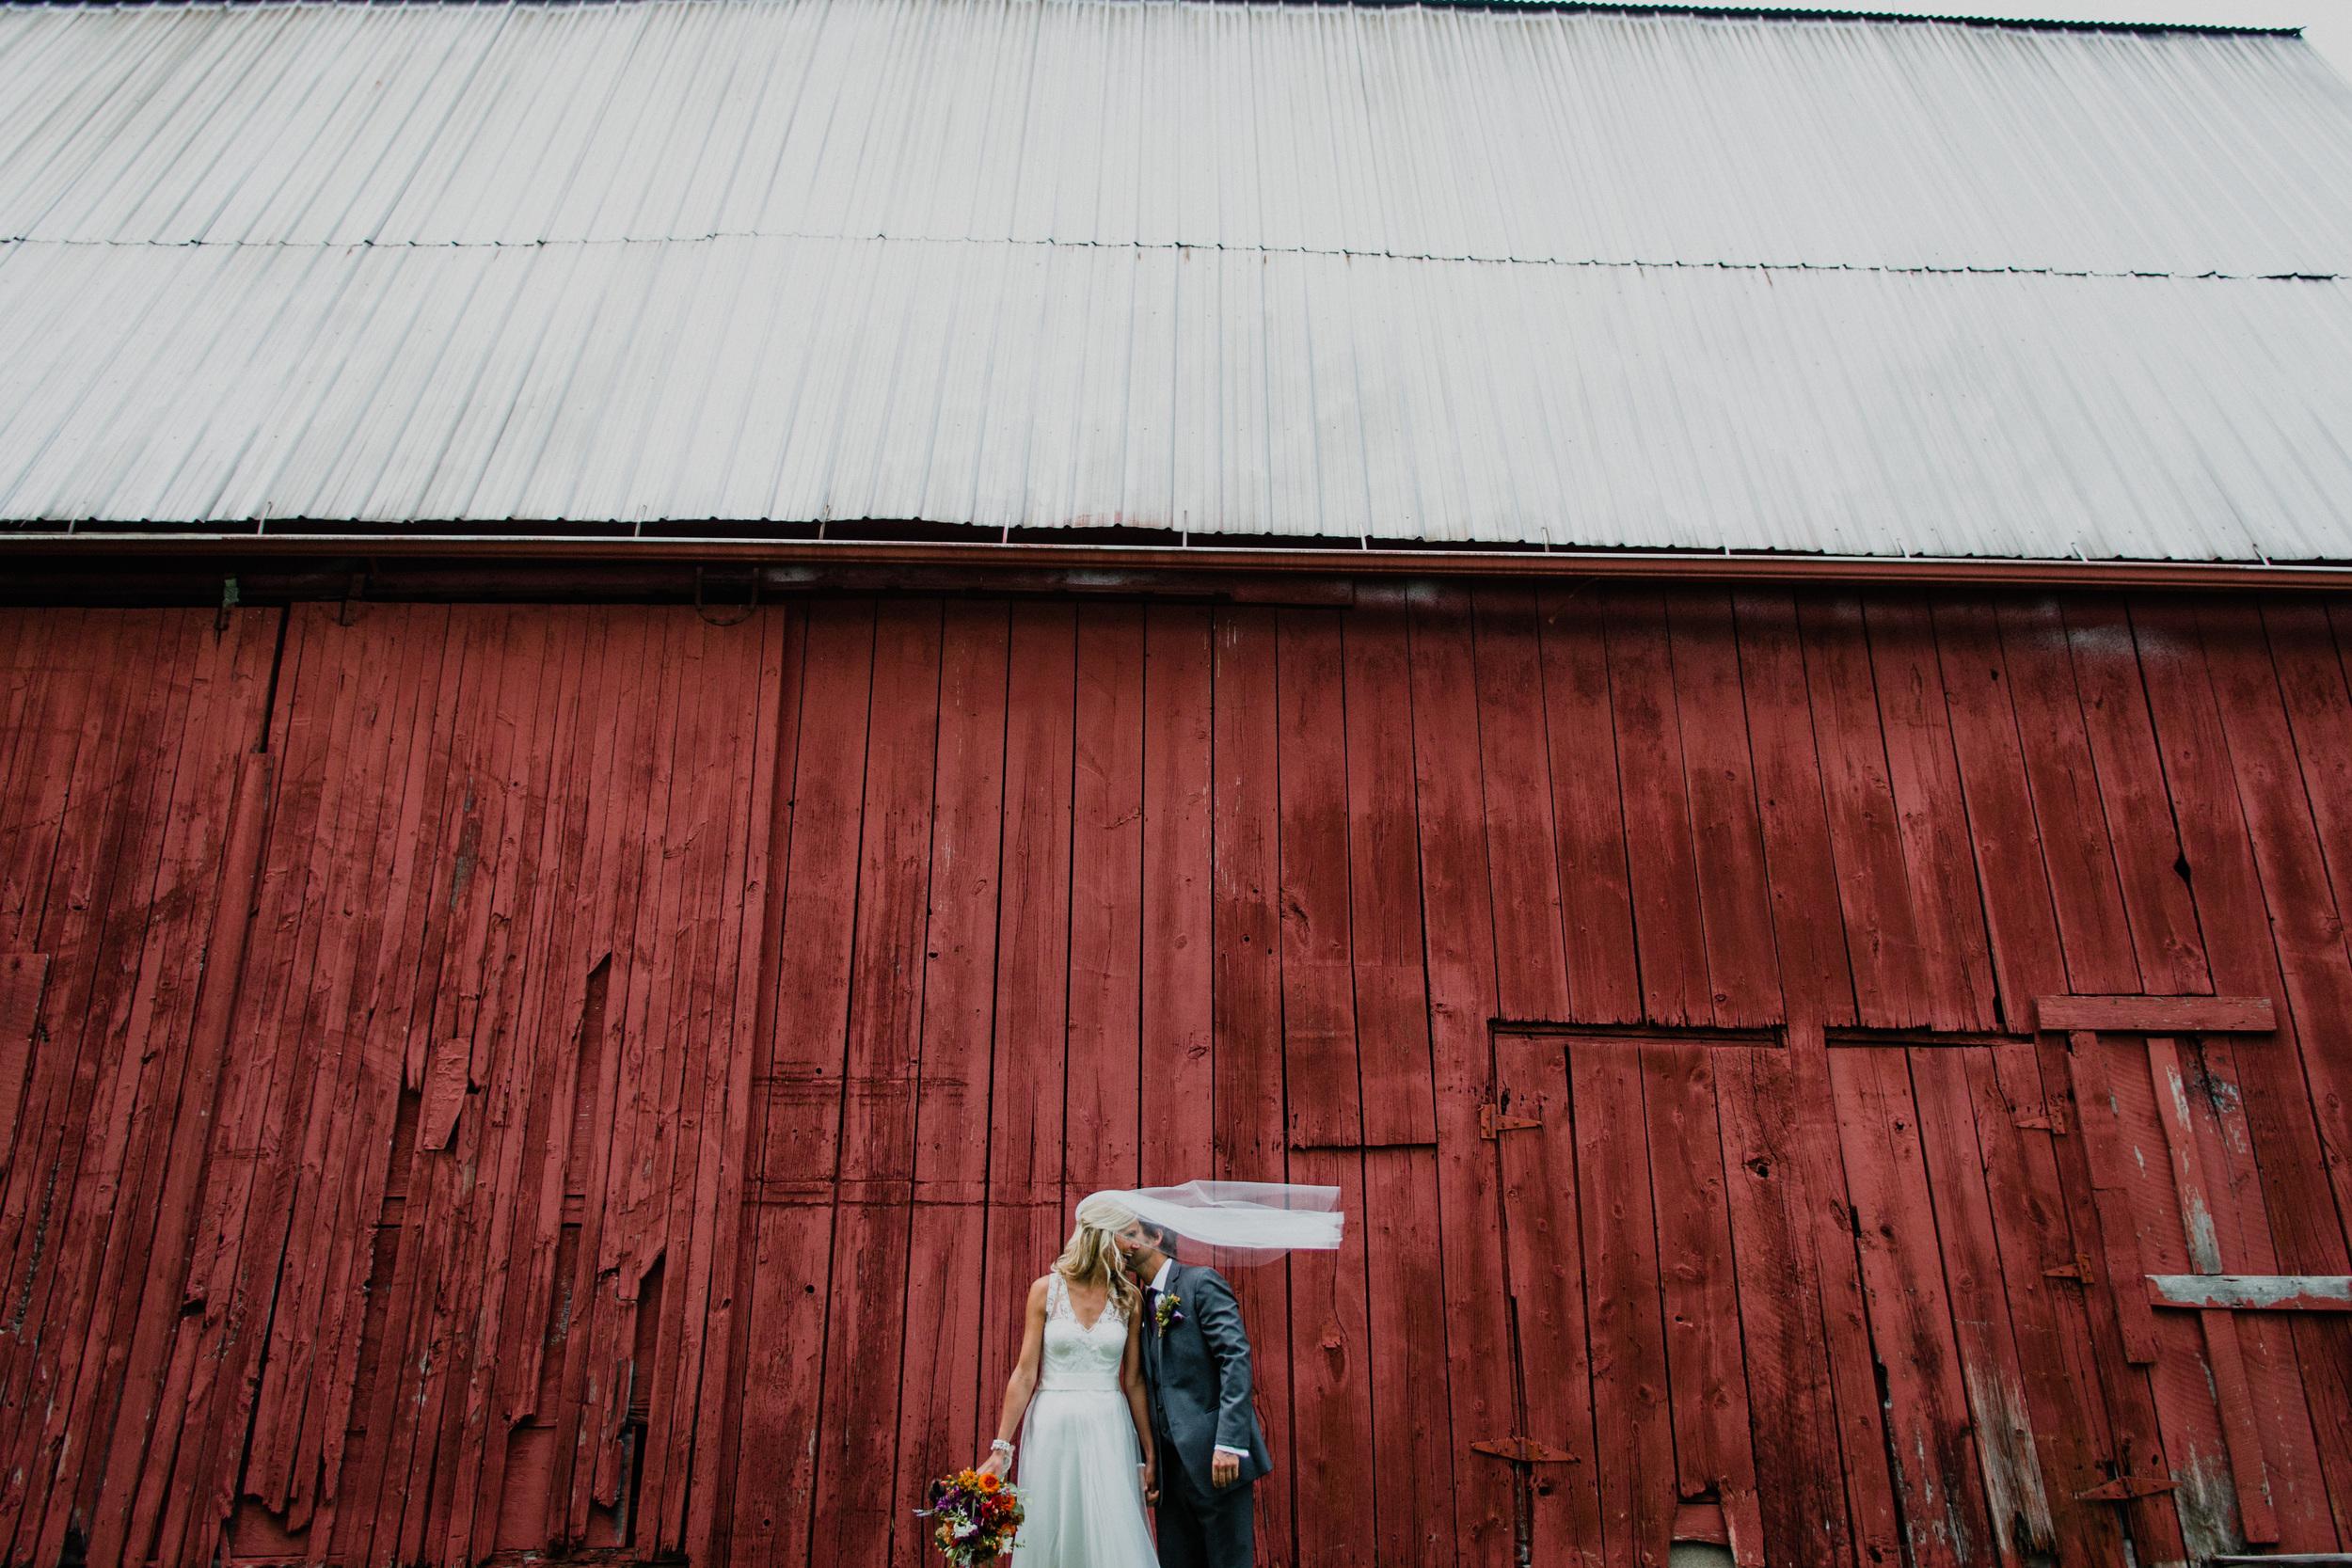 TomsCountryPlace-Avon-Wedding-Susie+Brian_M+JPhoto-4.JPG